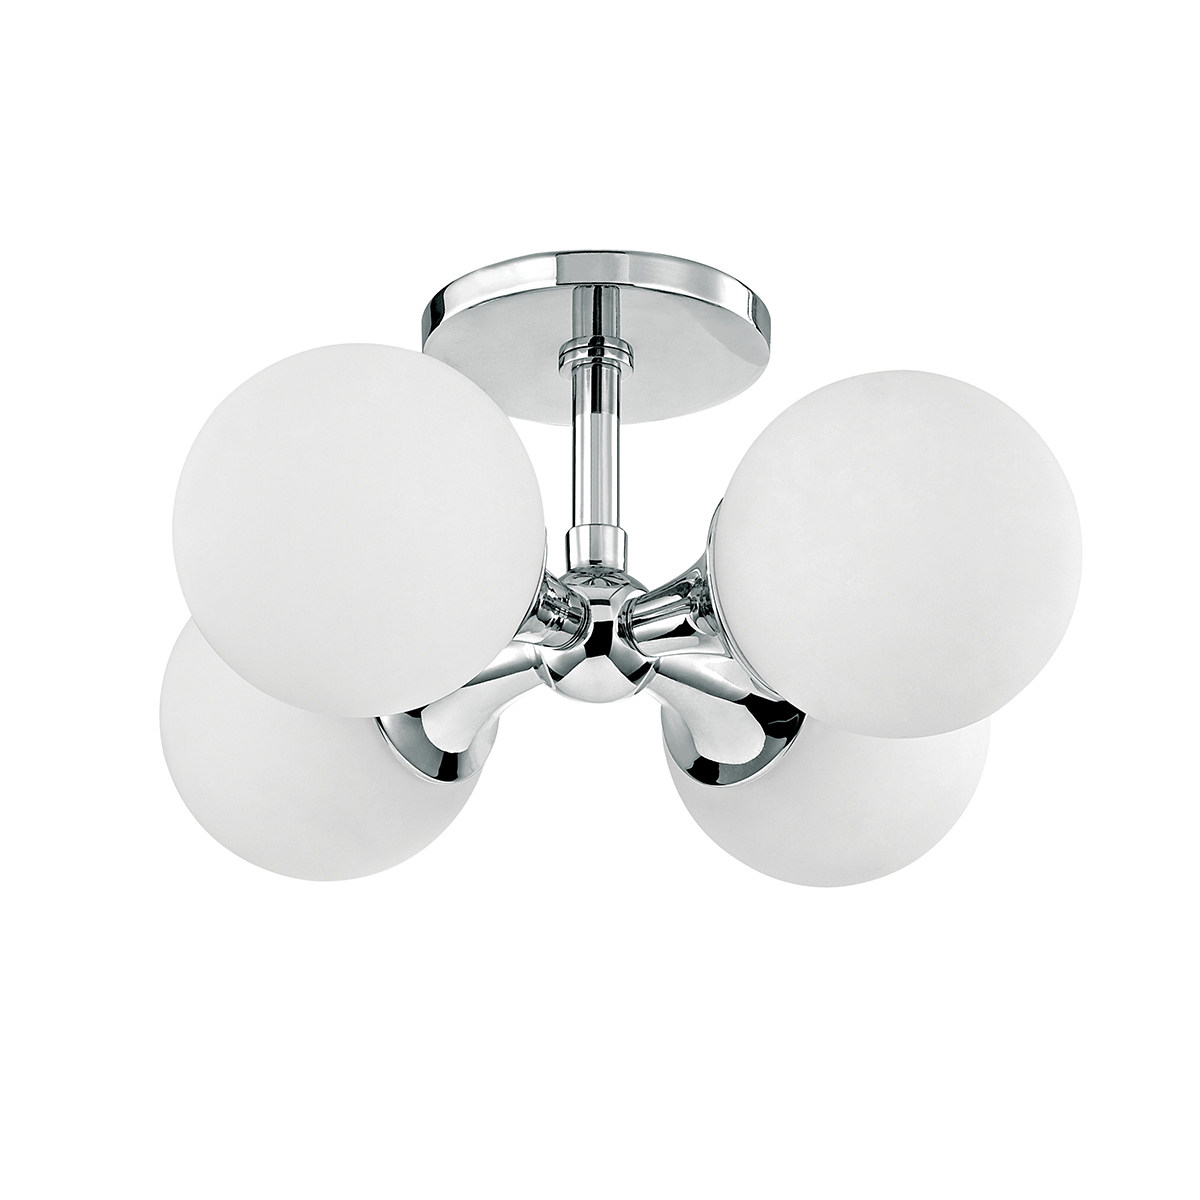 Quick View  sc 1 st  Hudson Valley Lighting & Products | Hudson Valley Lighting